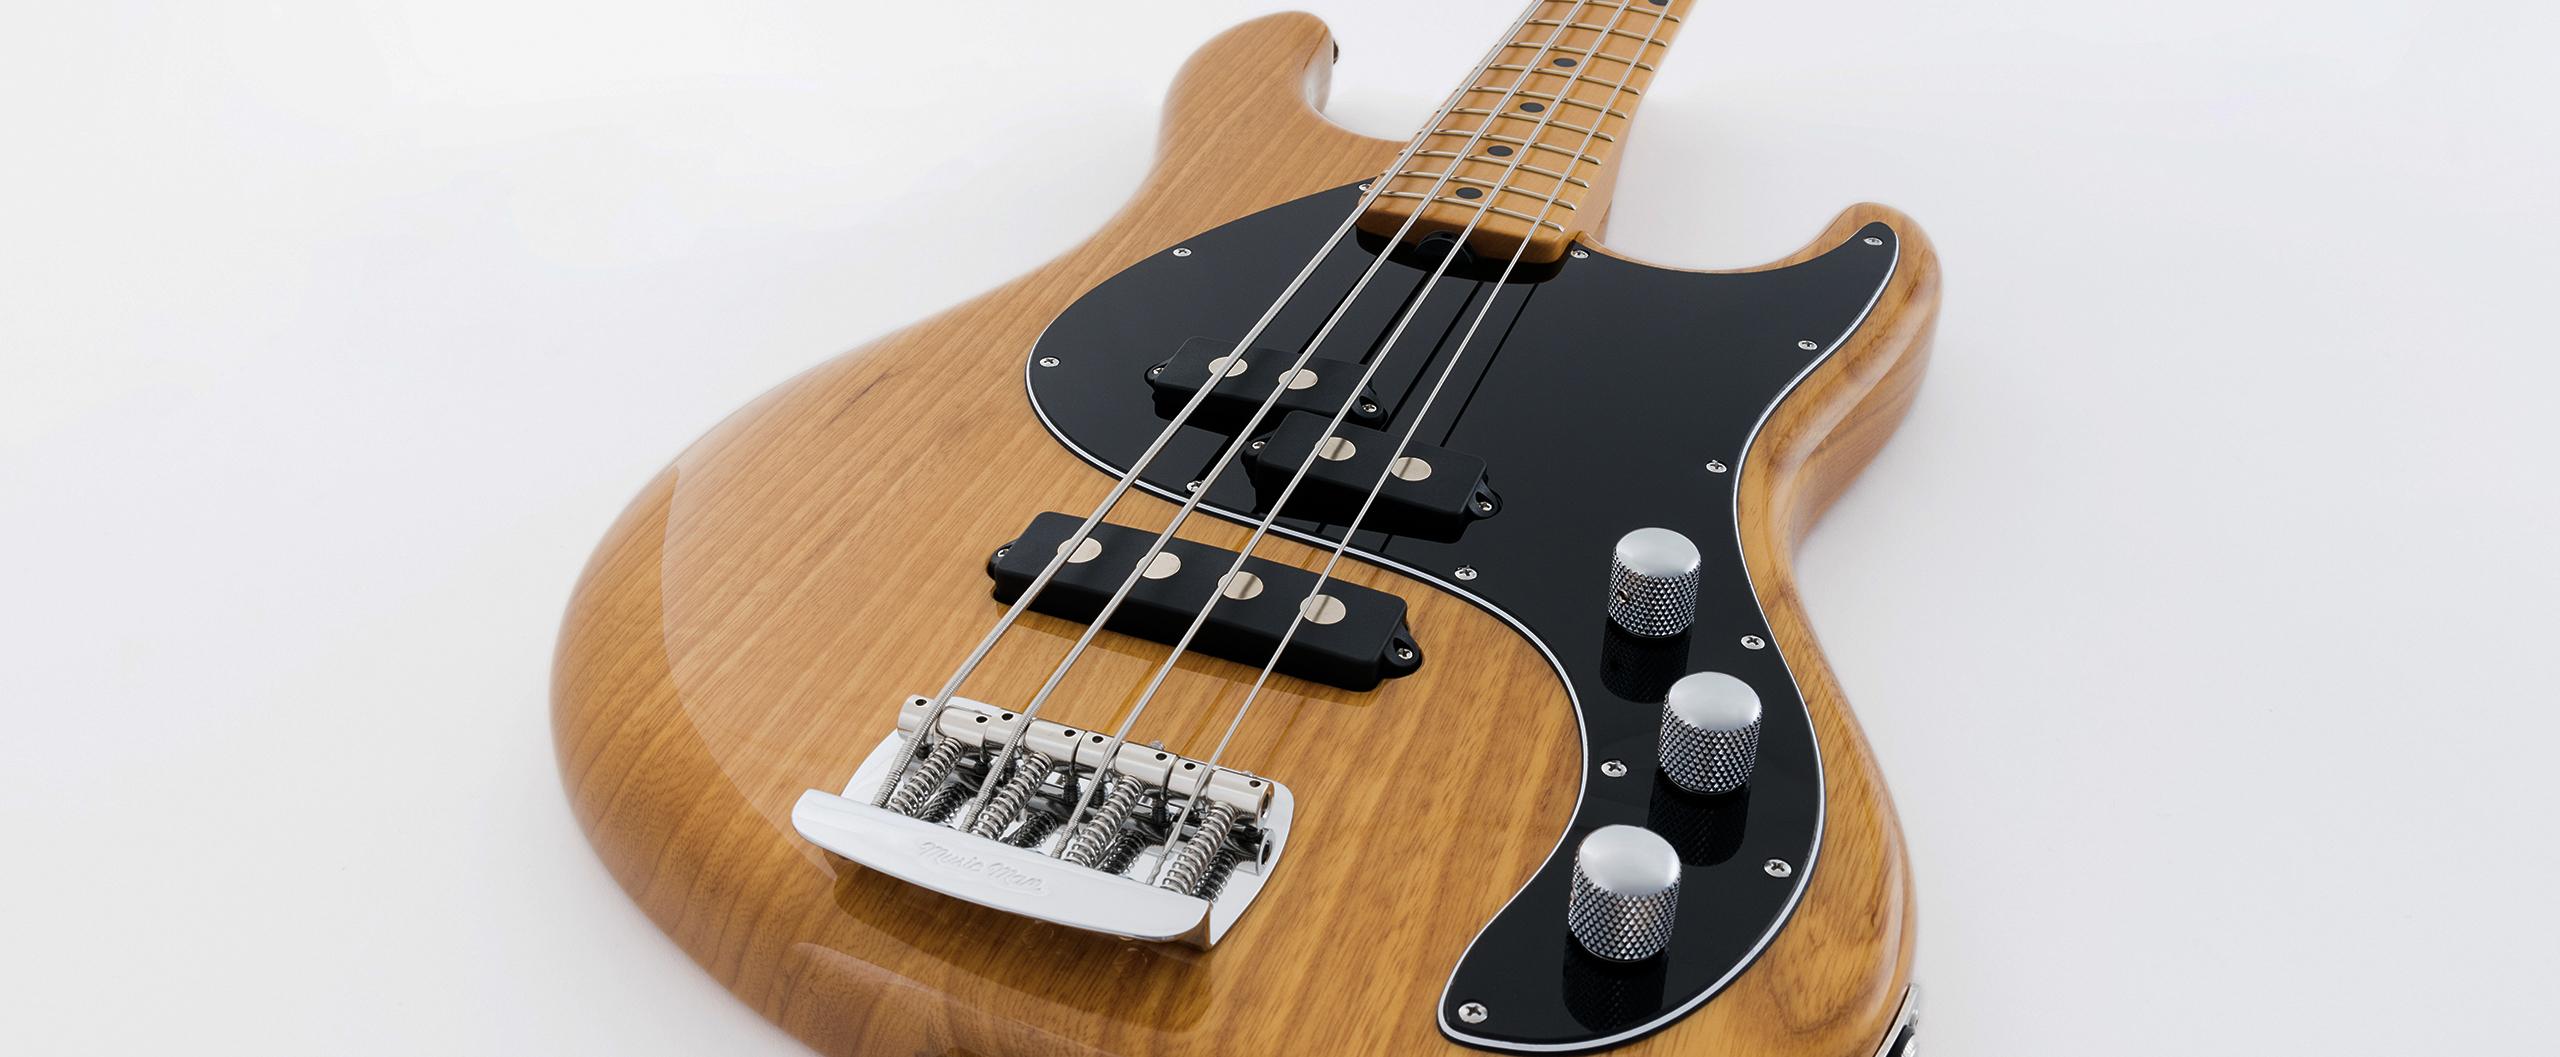 Caprice Bass Slide